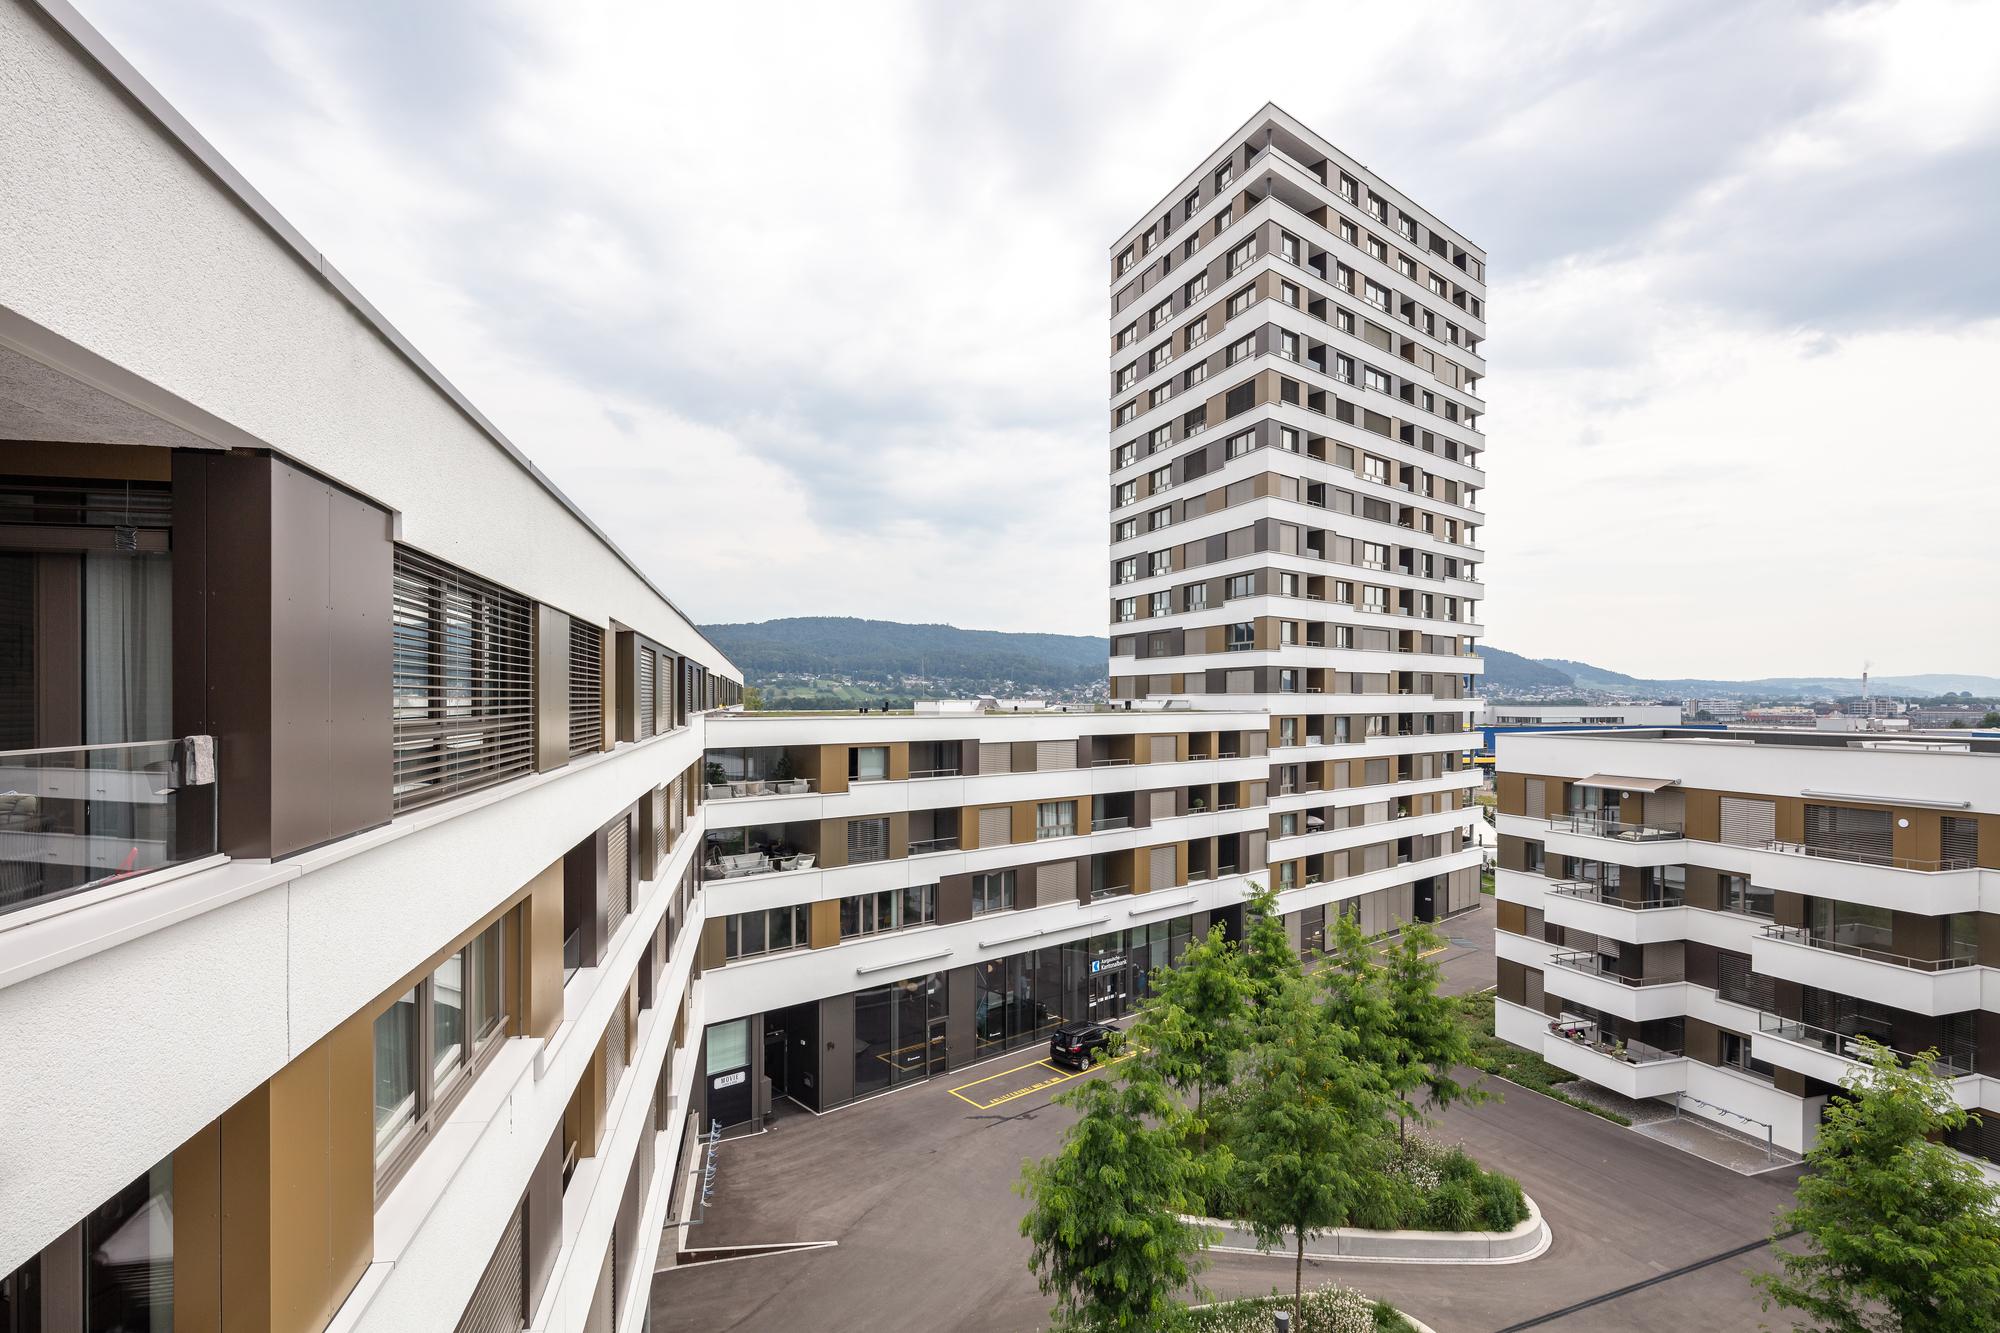 LimmatSpot-Apartments-Holzer-Kobler-Geb-ude